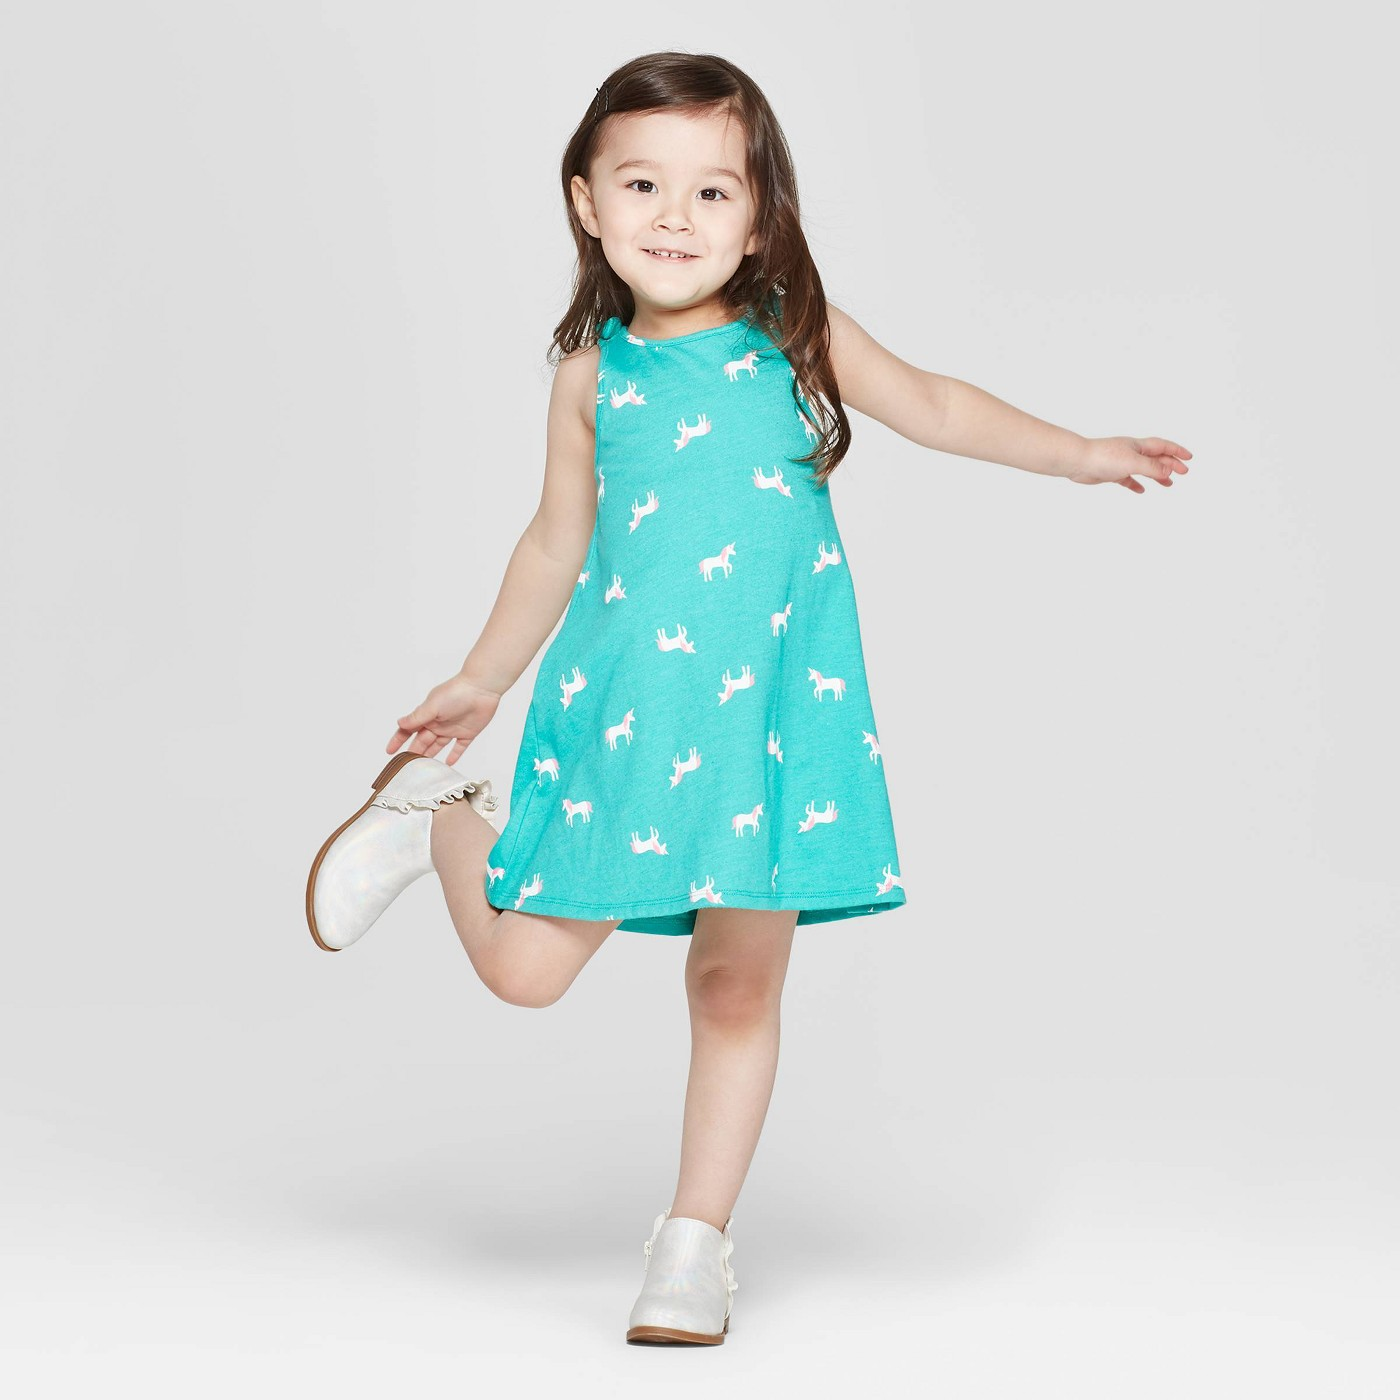 Toddler Girls' 'Unicorn' A Line Dress - Cat & Jack™ Aqua - image 1 of 3